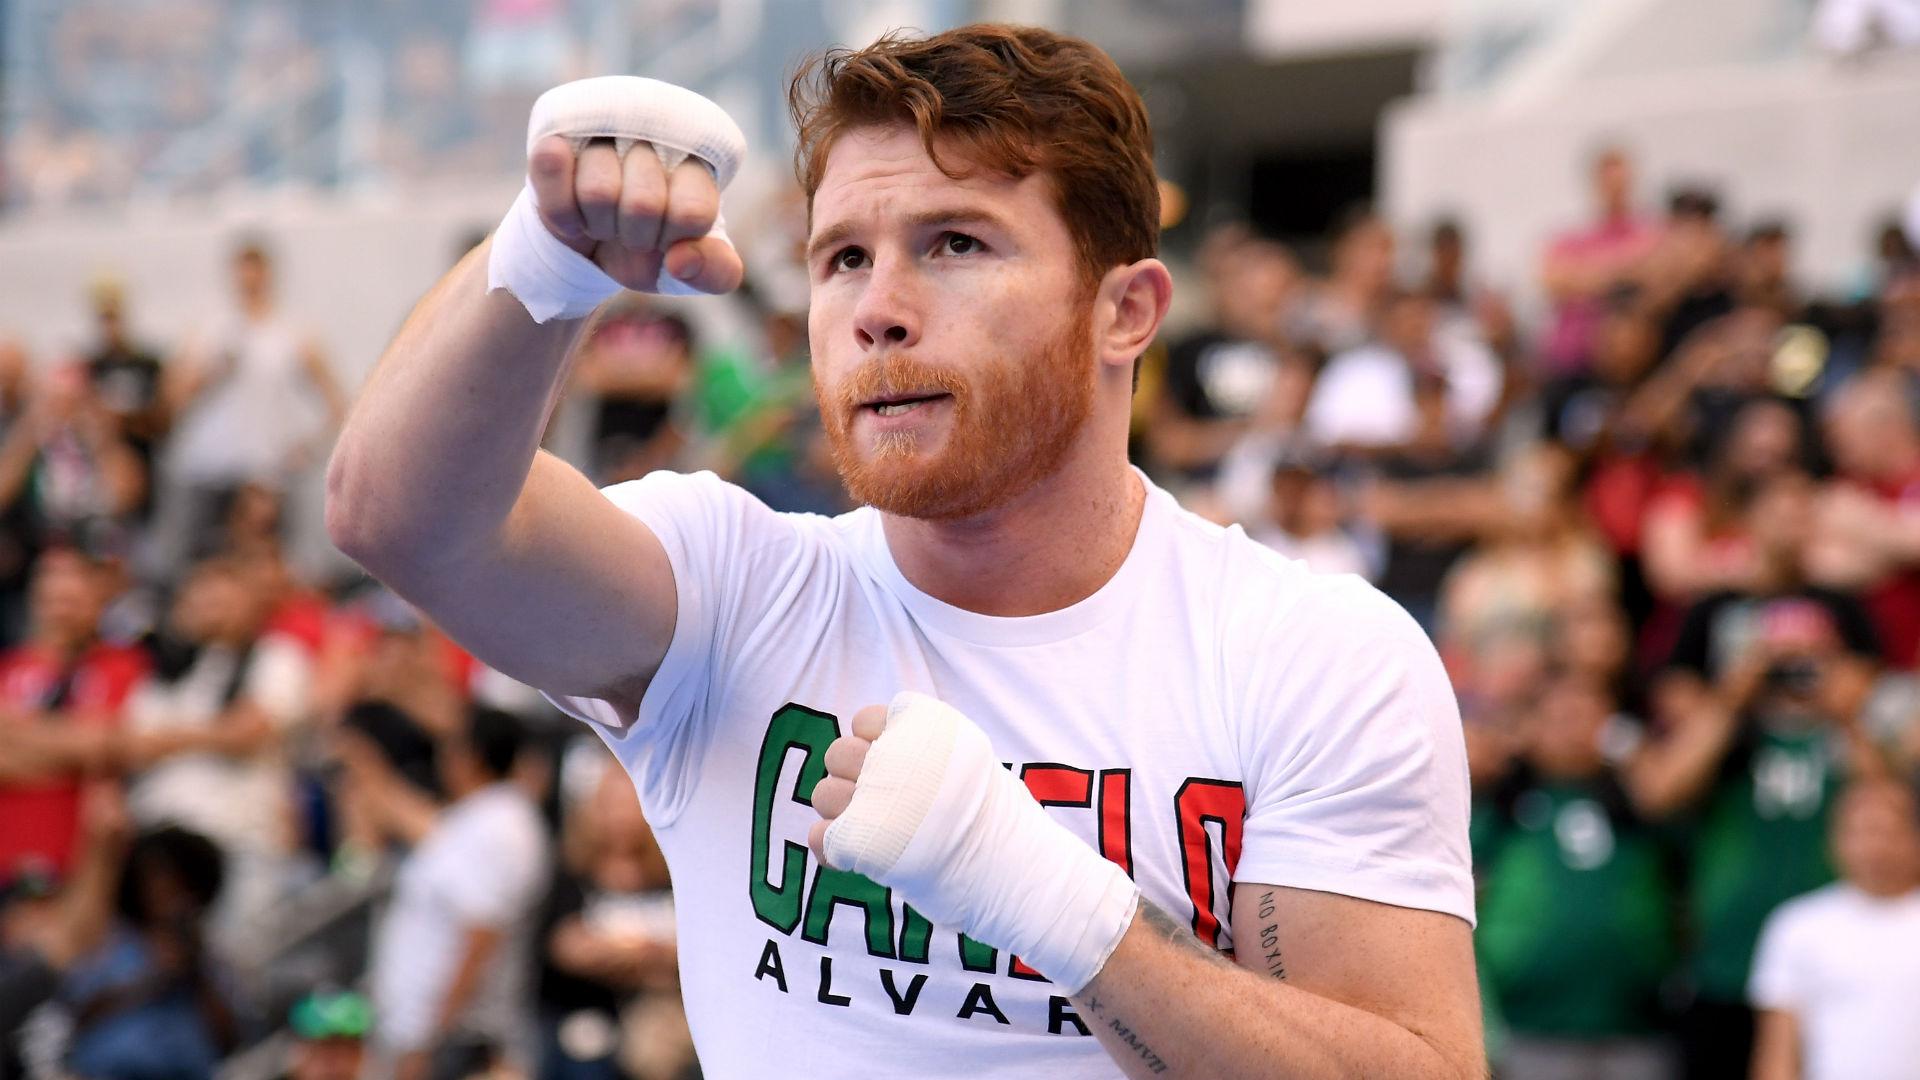 Canelo vs. GGG 2: Oscar De la Hoya says Alvarez wants to make Golovkin pay for doping comments